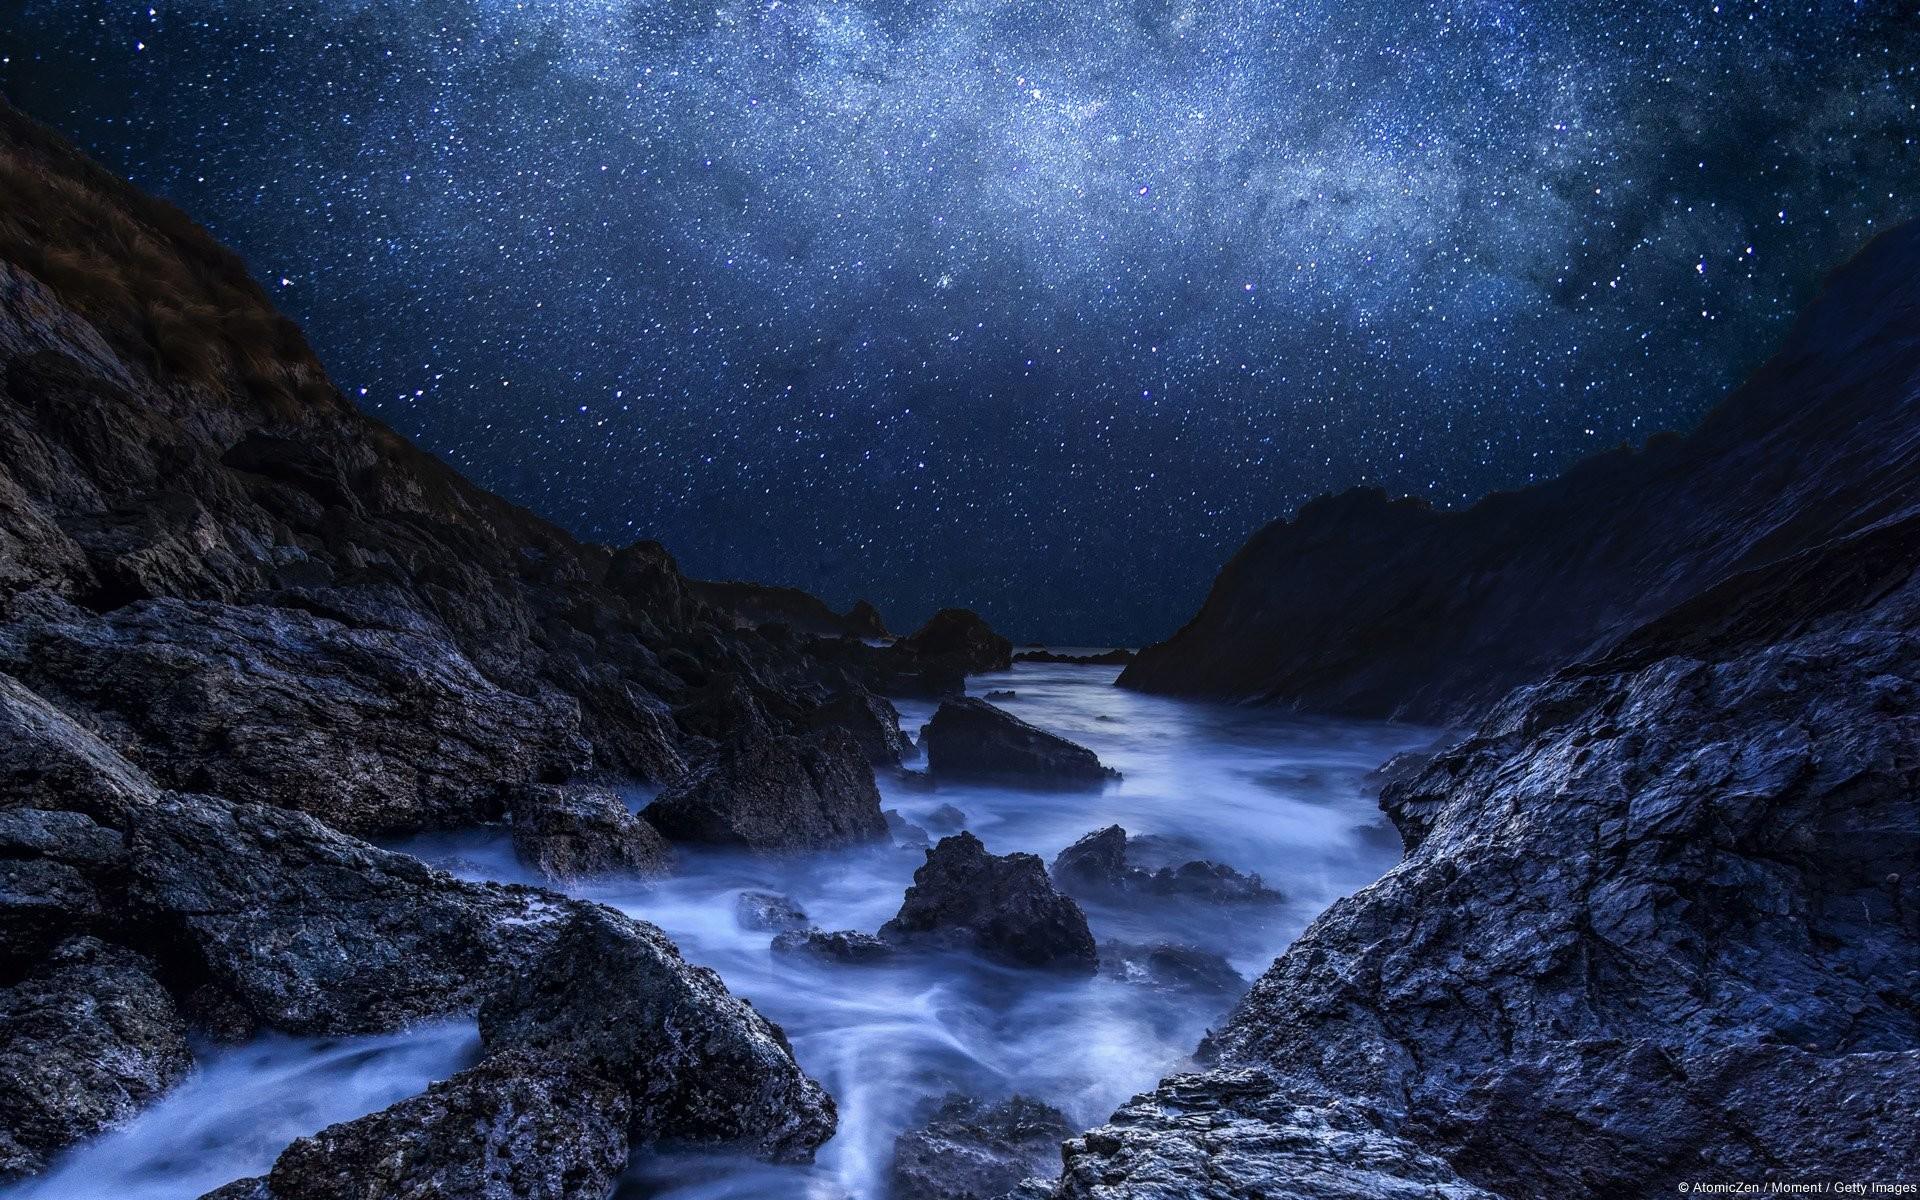 Earth – Night Earth Starry Sky Stars Winter Mountain River Rock Wallpaper